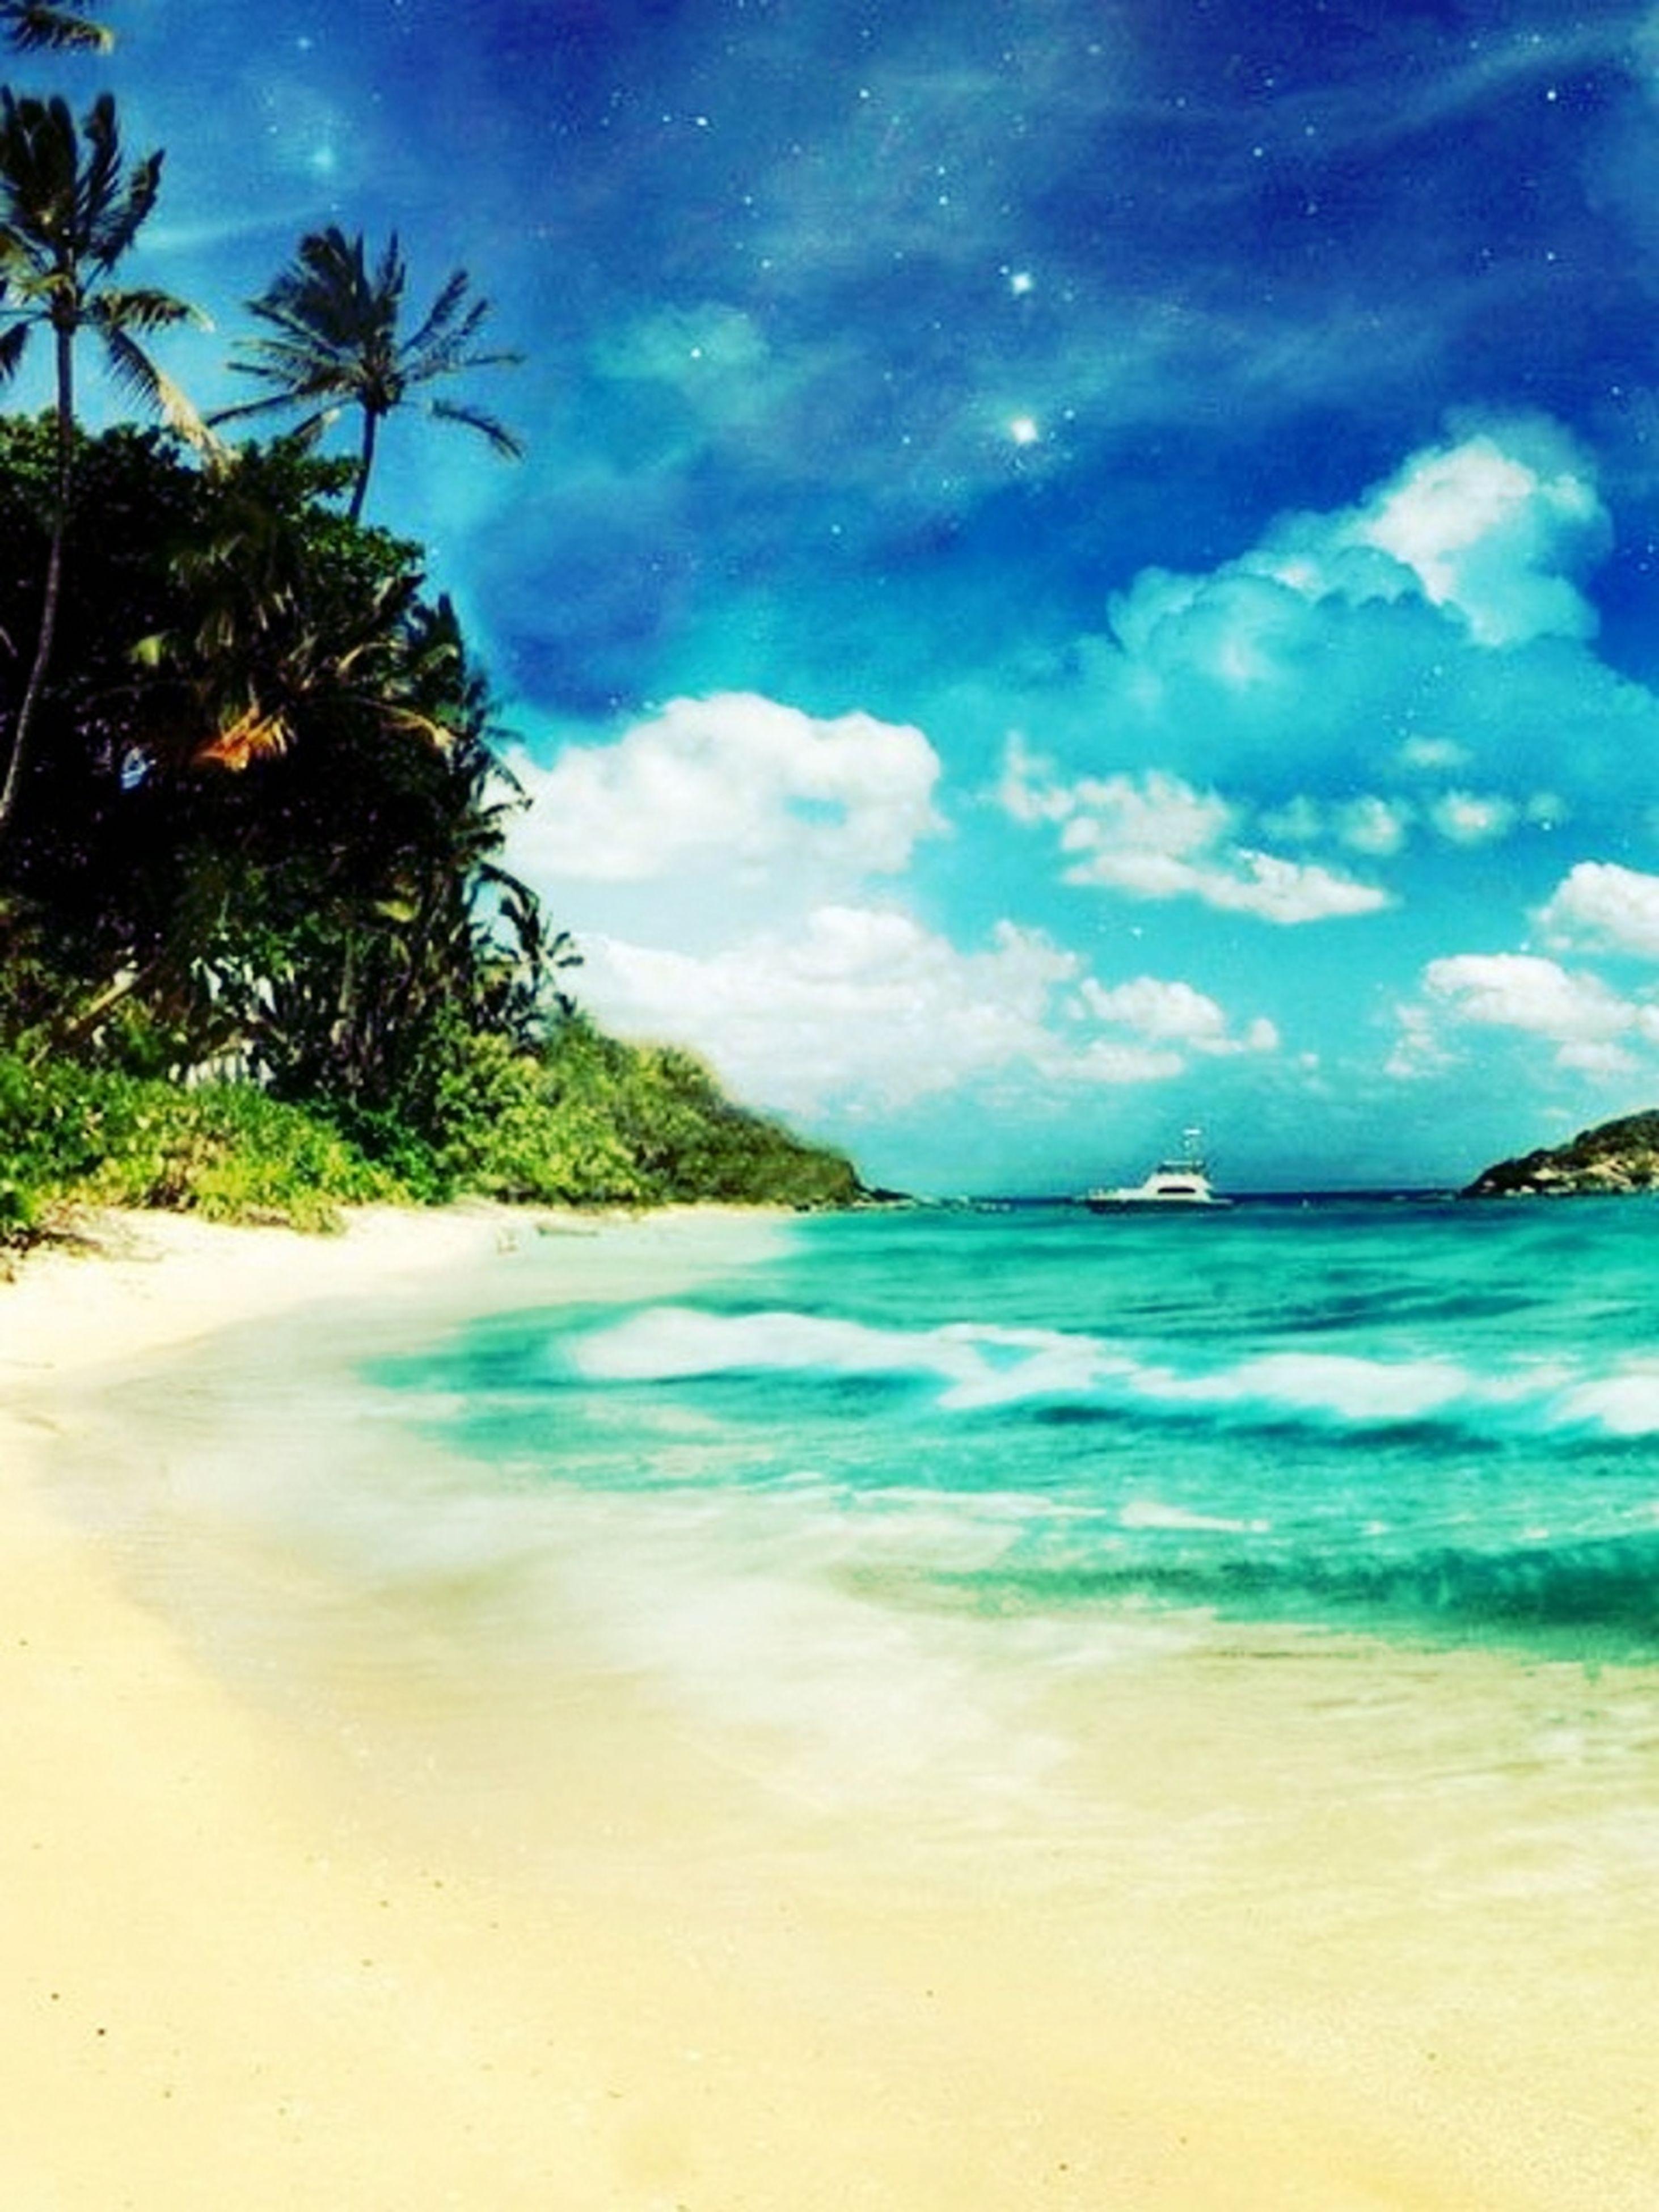 sea, water, beach, sky, palm tree, blue, tranquil scene, tranquility, scenics, tree, beauty in nature, shore, sand, horizon over water, cloud - sky, nature, cloud, idyllic, coastline, outdoors